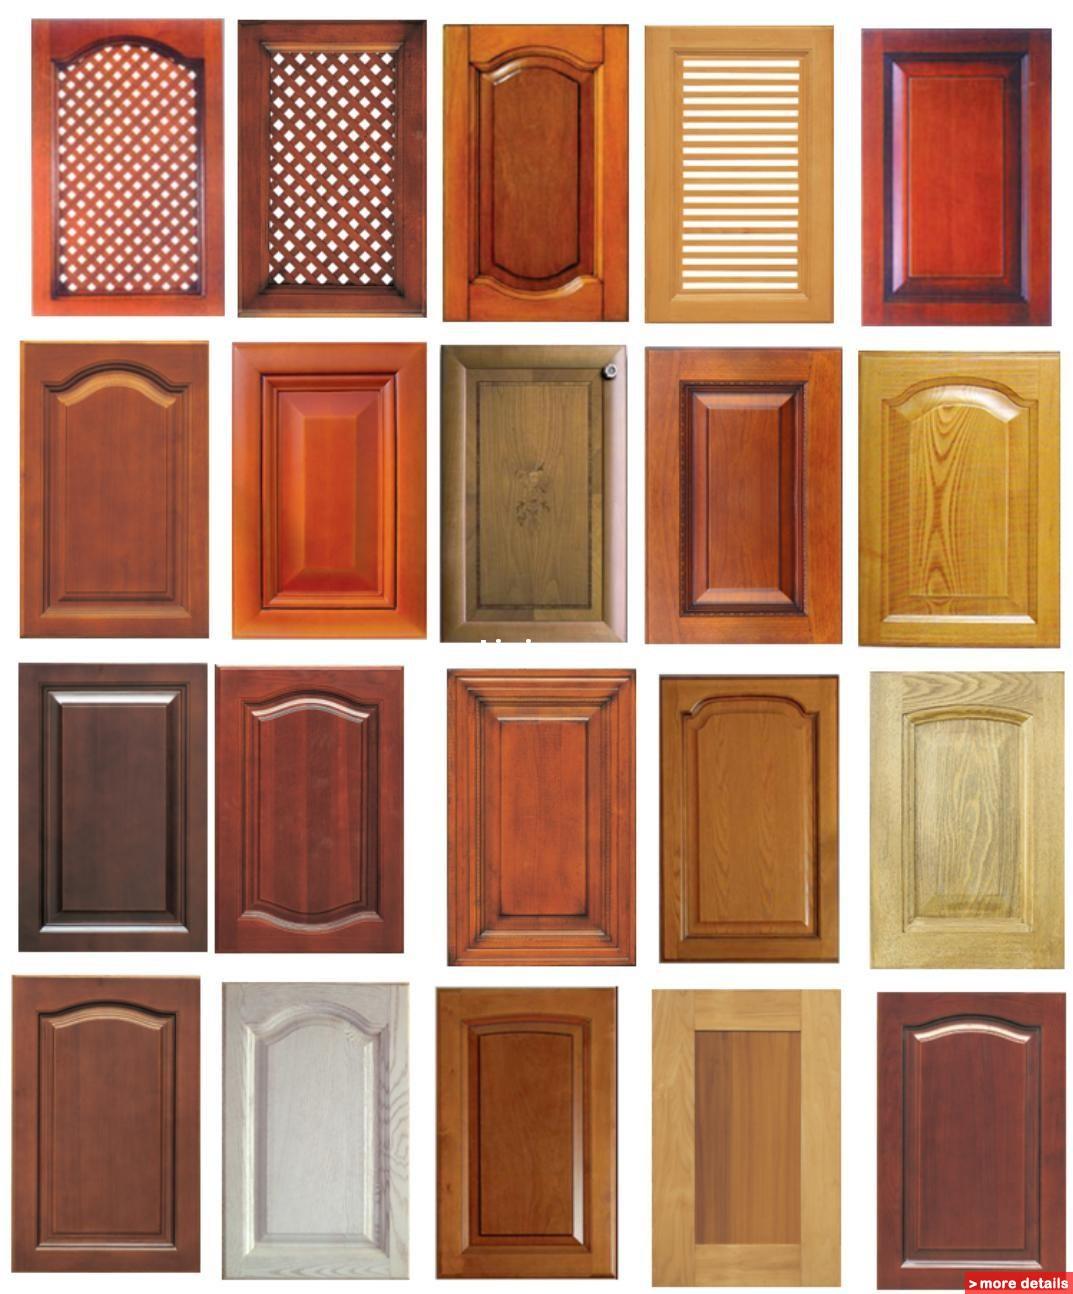 Apple X Design Double Colors Pvc Seal Mdf Kitchen Cabinet Panel Door Buy Mdf Kitchen Cabinet Door Kitchen Cabinet Panel Doors Kitchen Cabinet Door